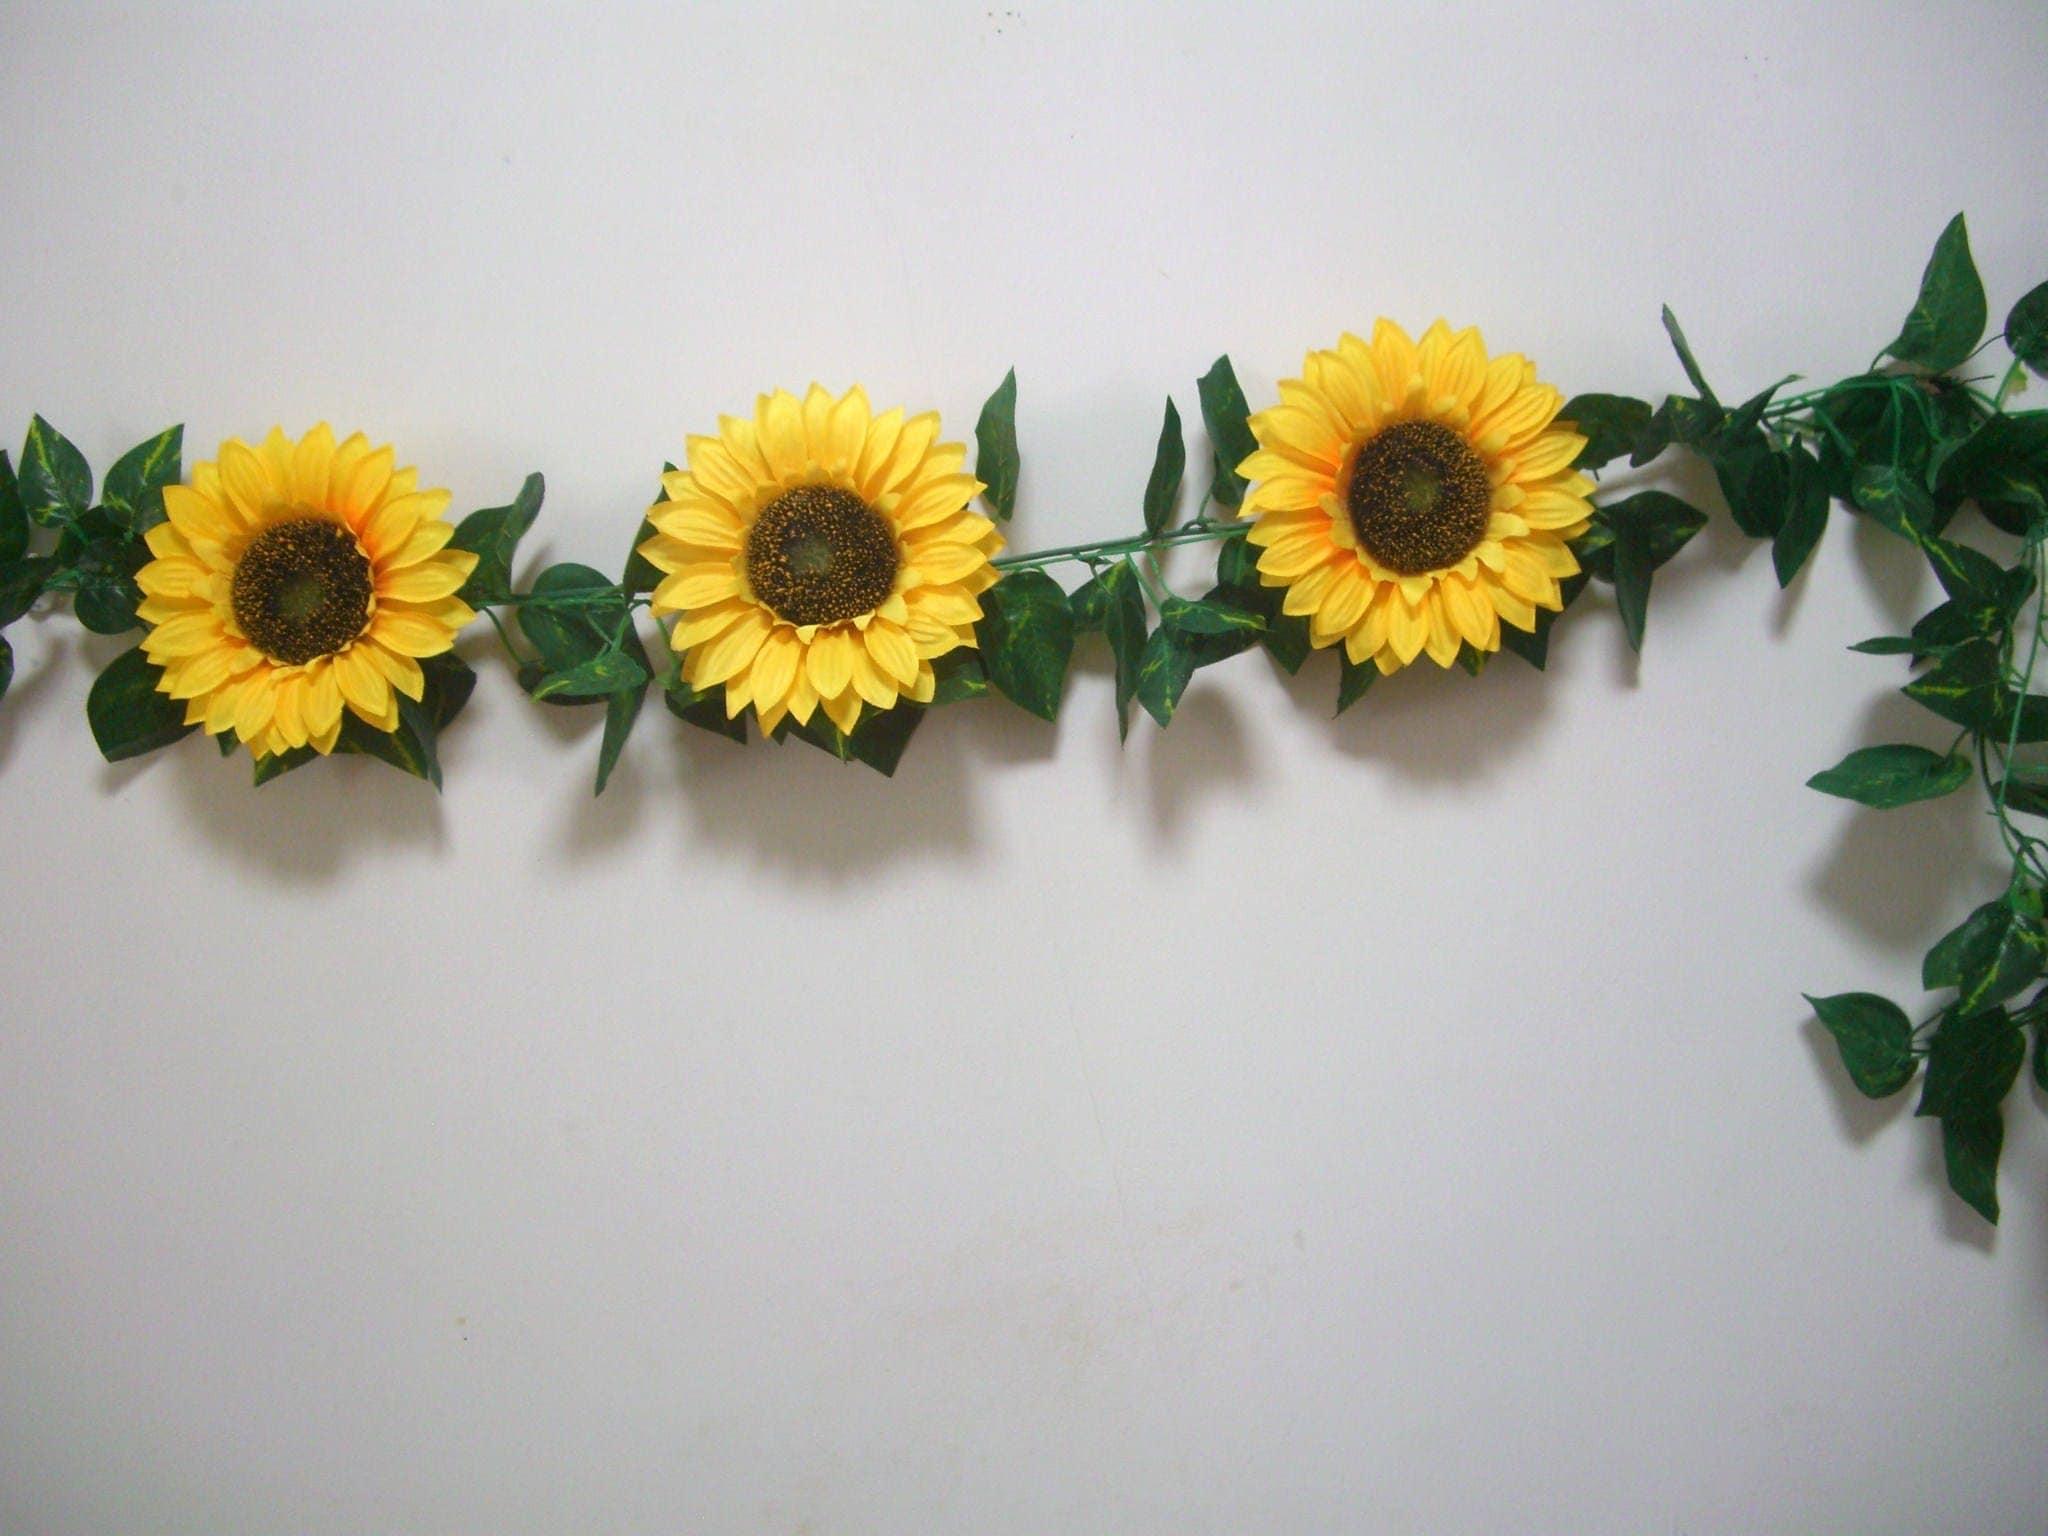 Famous Silk Flower Garland For Weddings Vignette - The Wedding Ideas ...